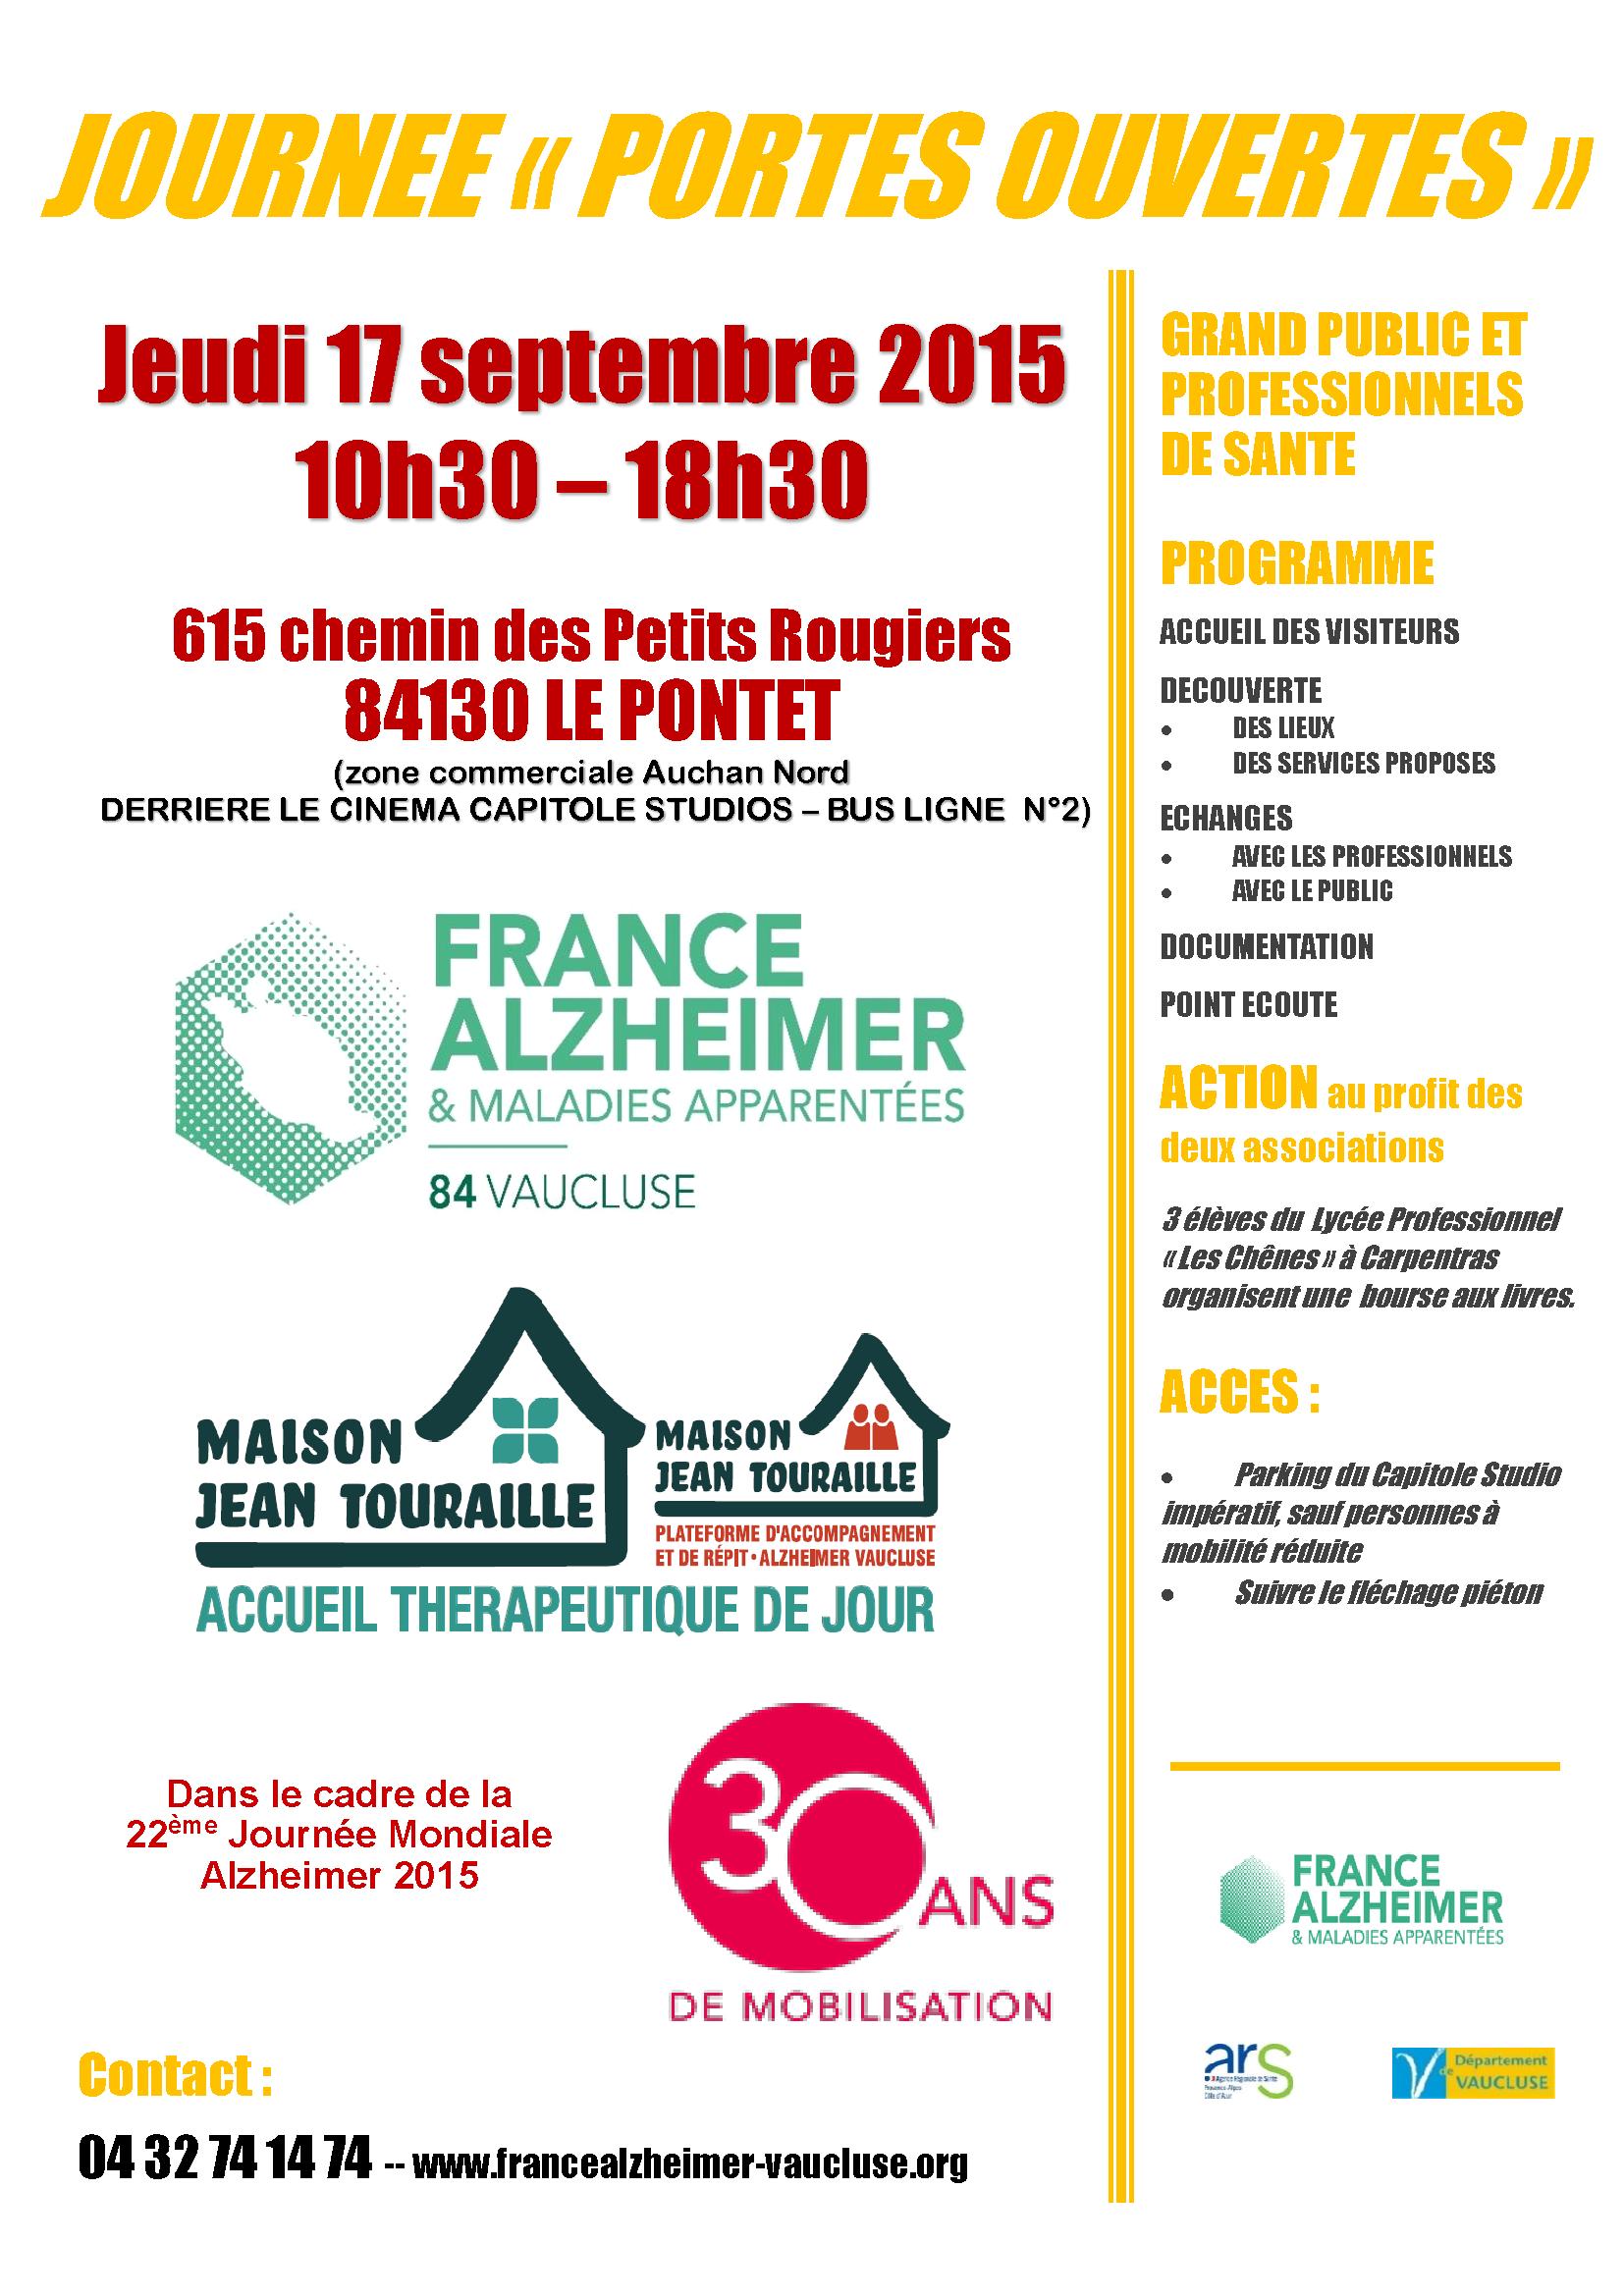 France Alzheimer Vaucluse